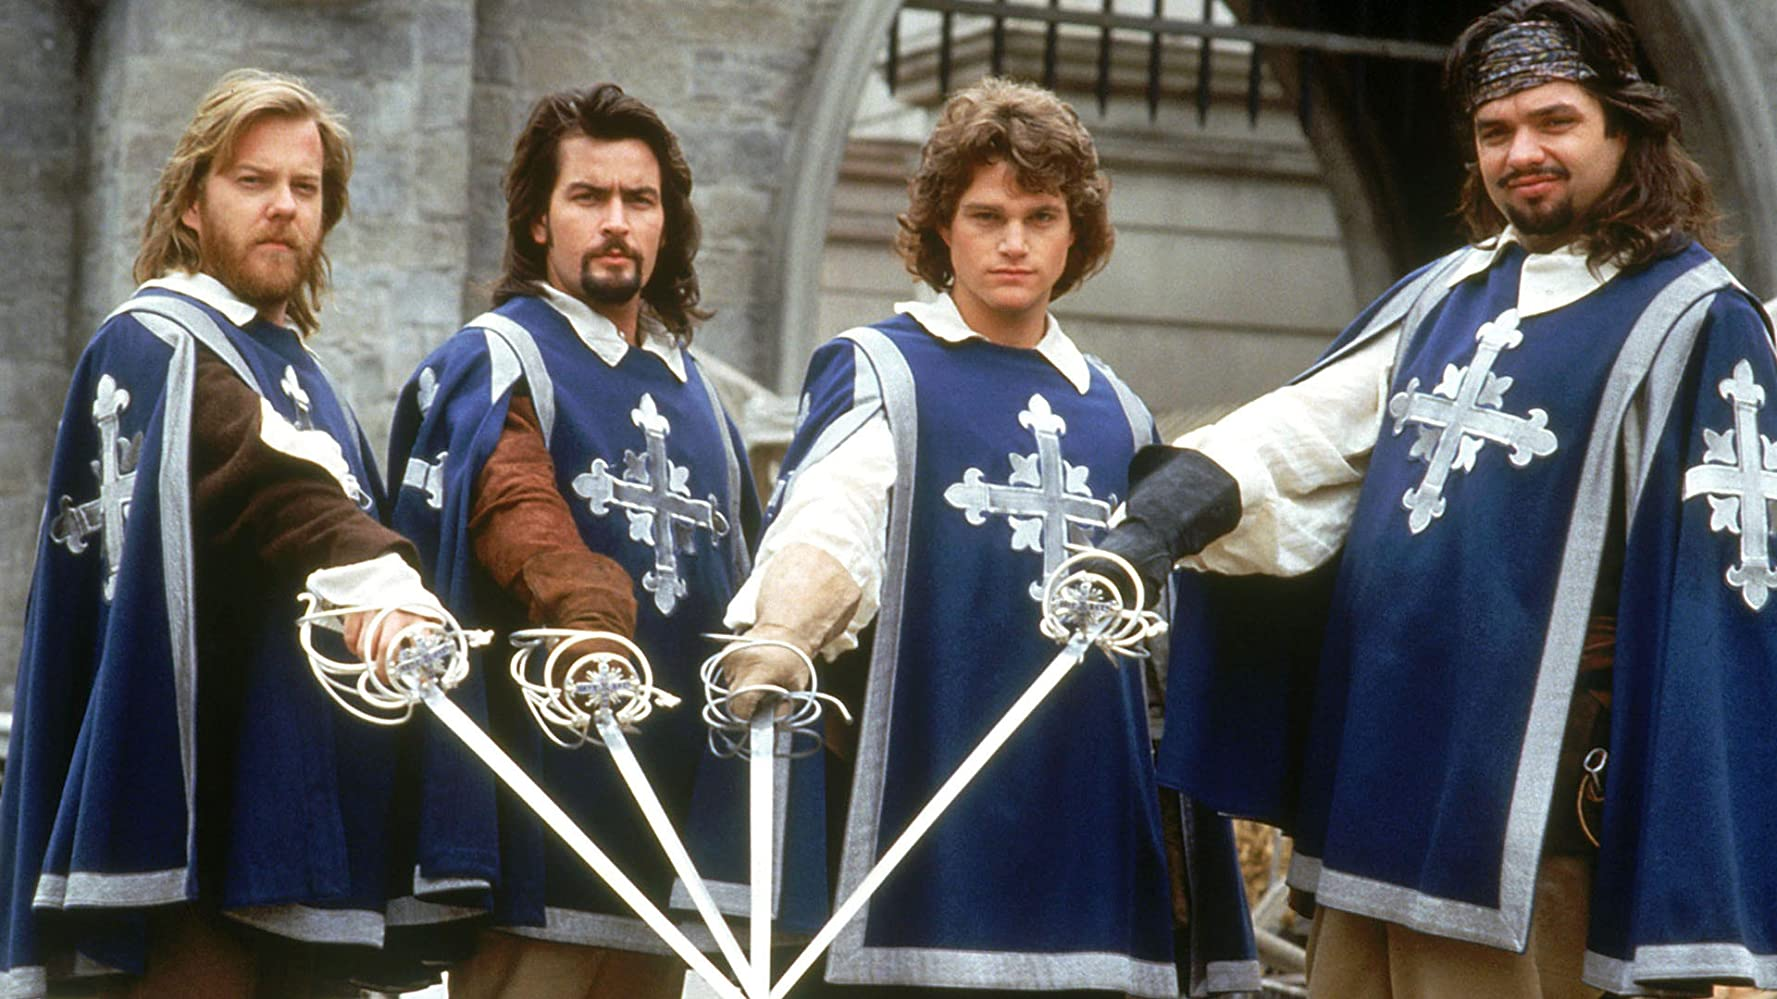 three musketeers 1993 final battle